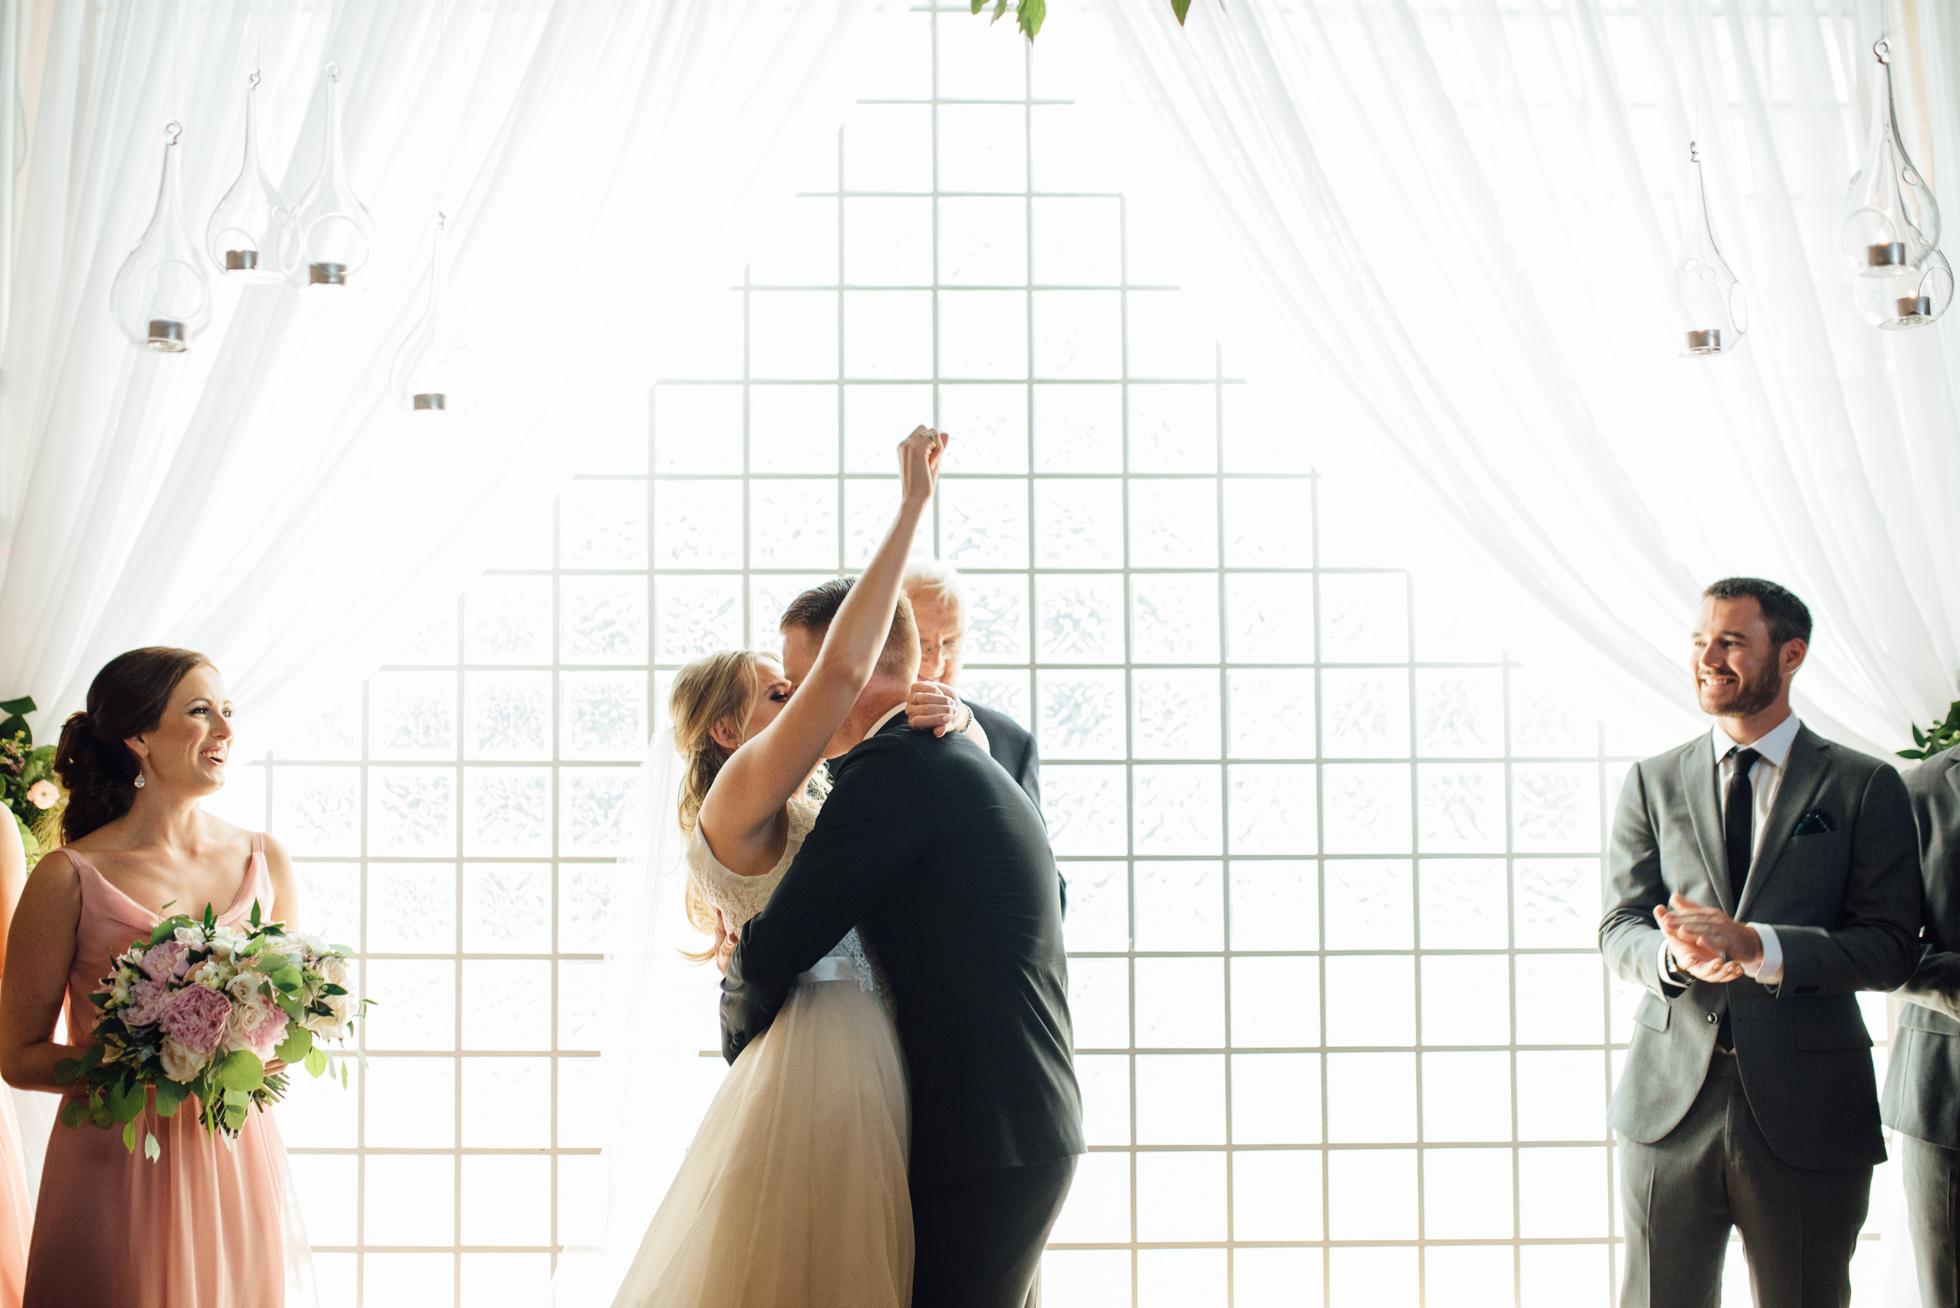 99-Sudbury-Toronto-Wedding-Photography-26.jpg